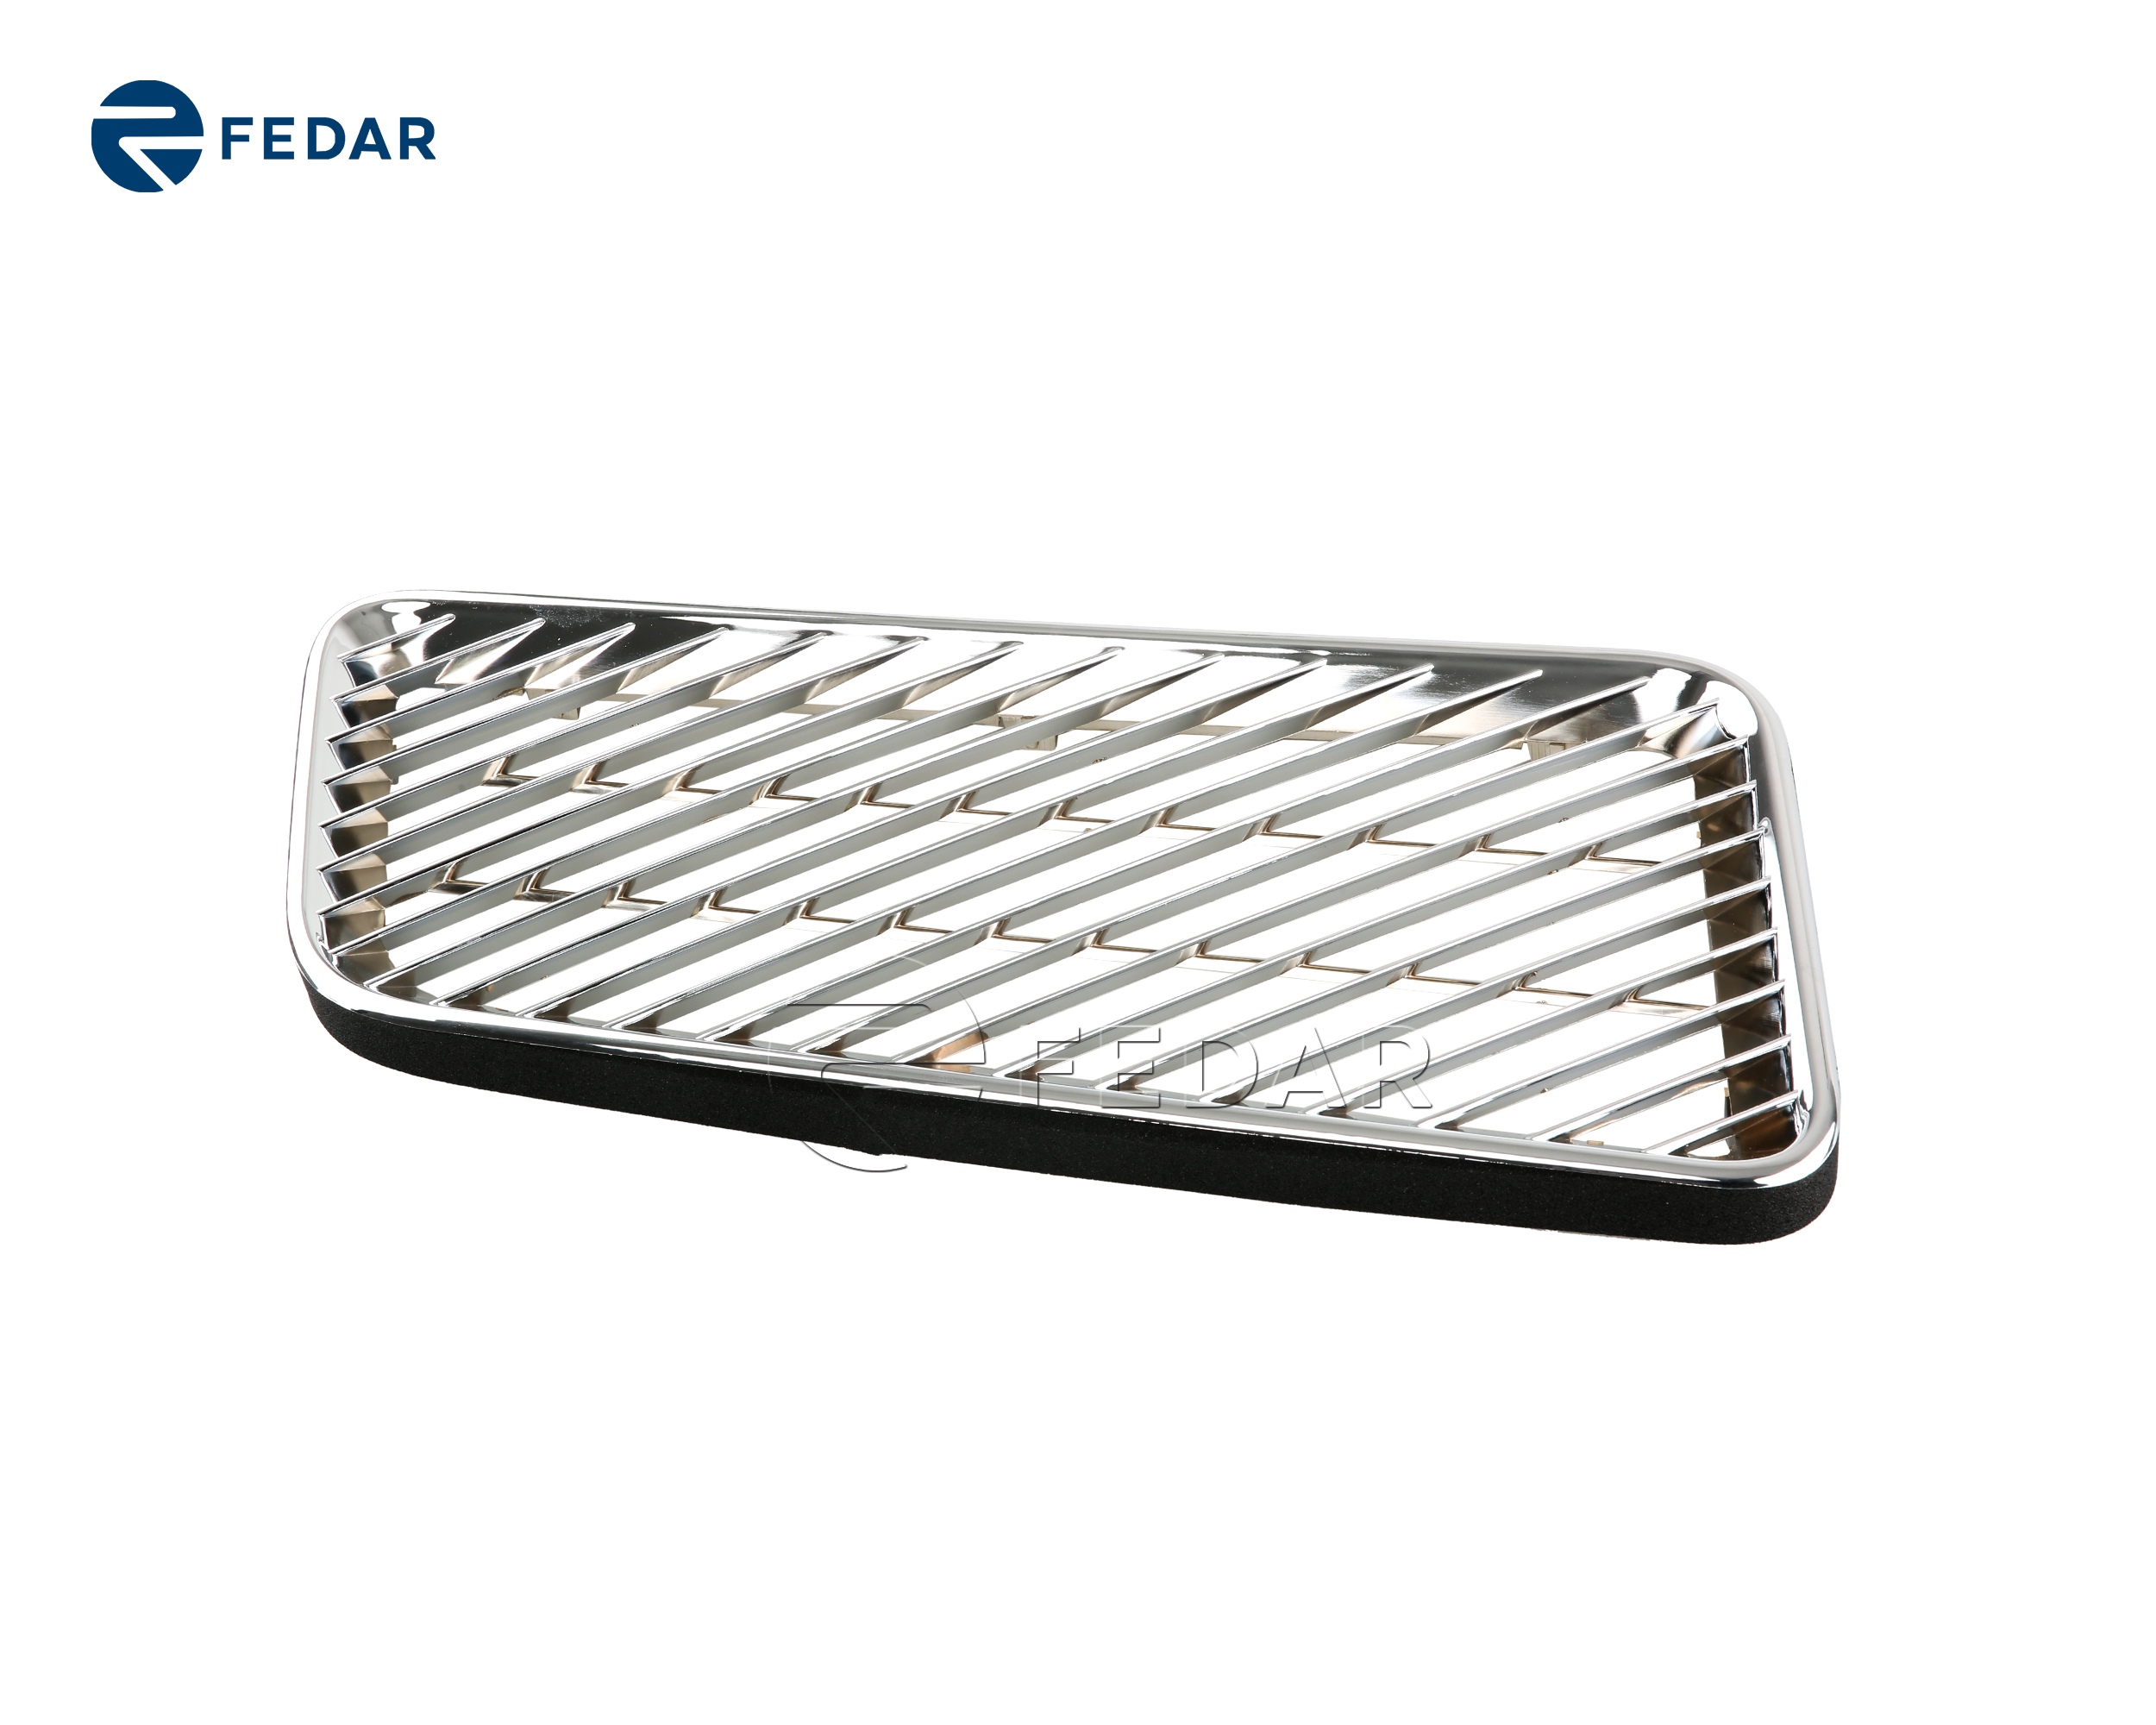 Fedar Air Intake Side For Volvo Vn Series Grille